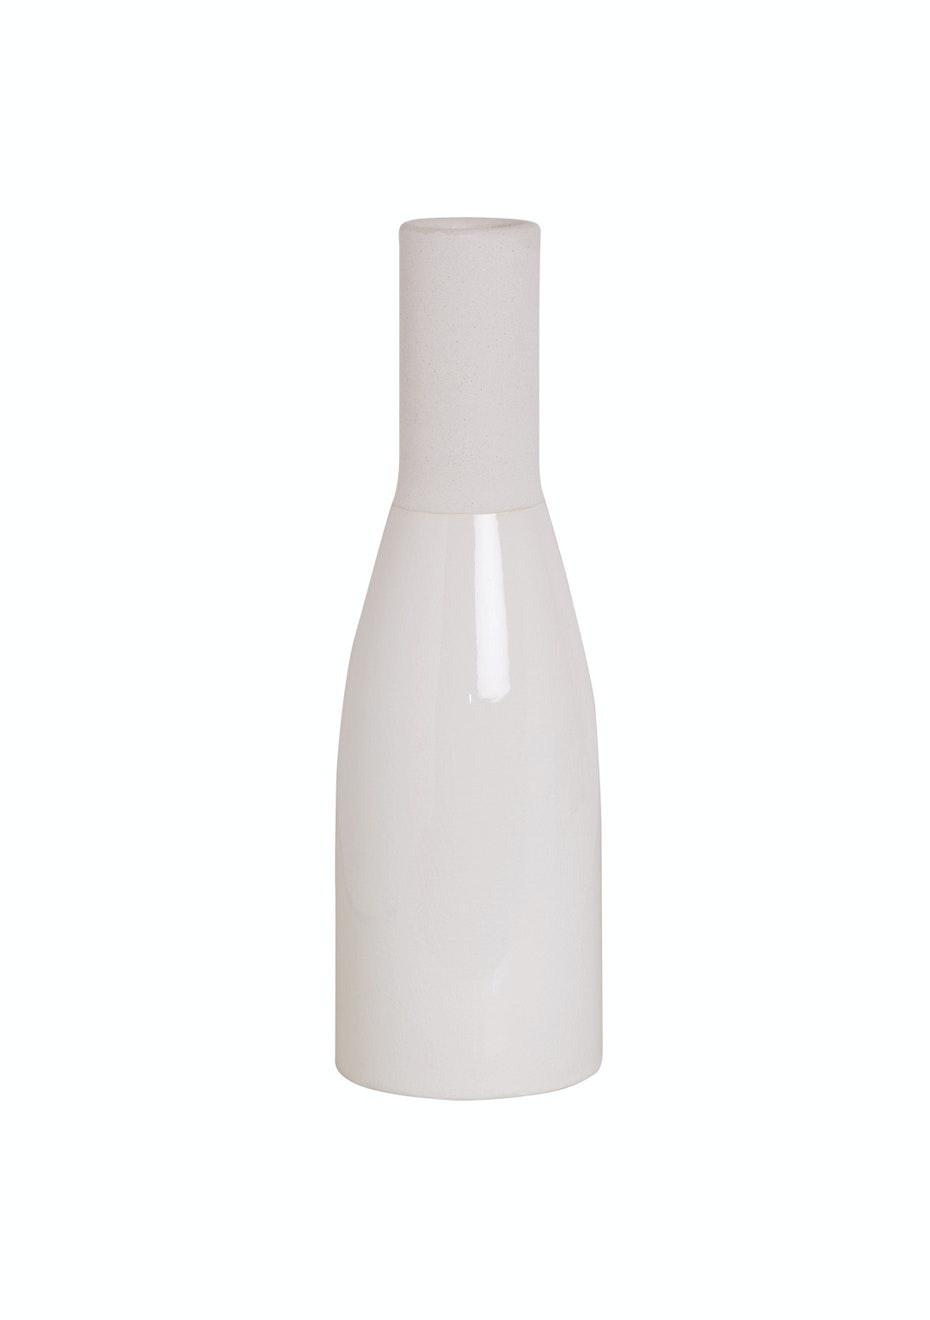 Jason - White Ceramic Vase